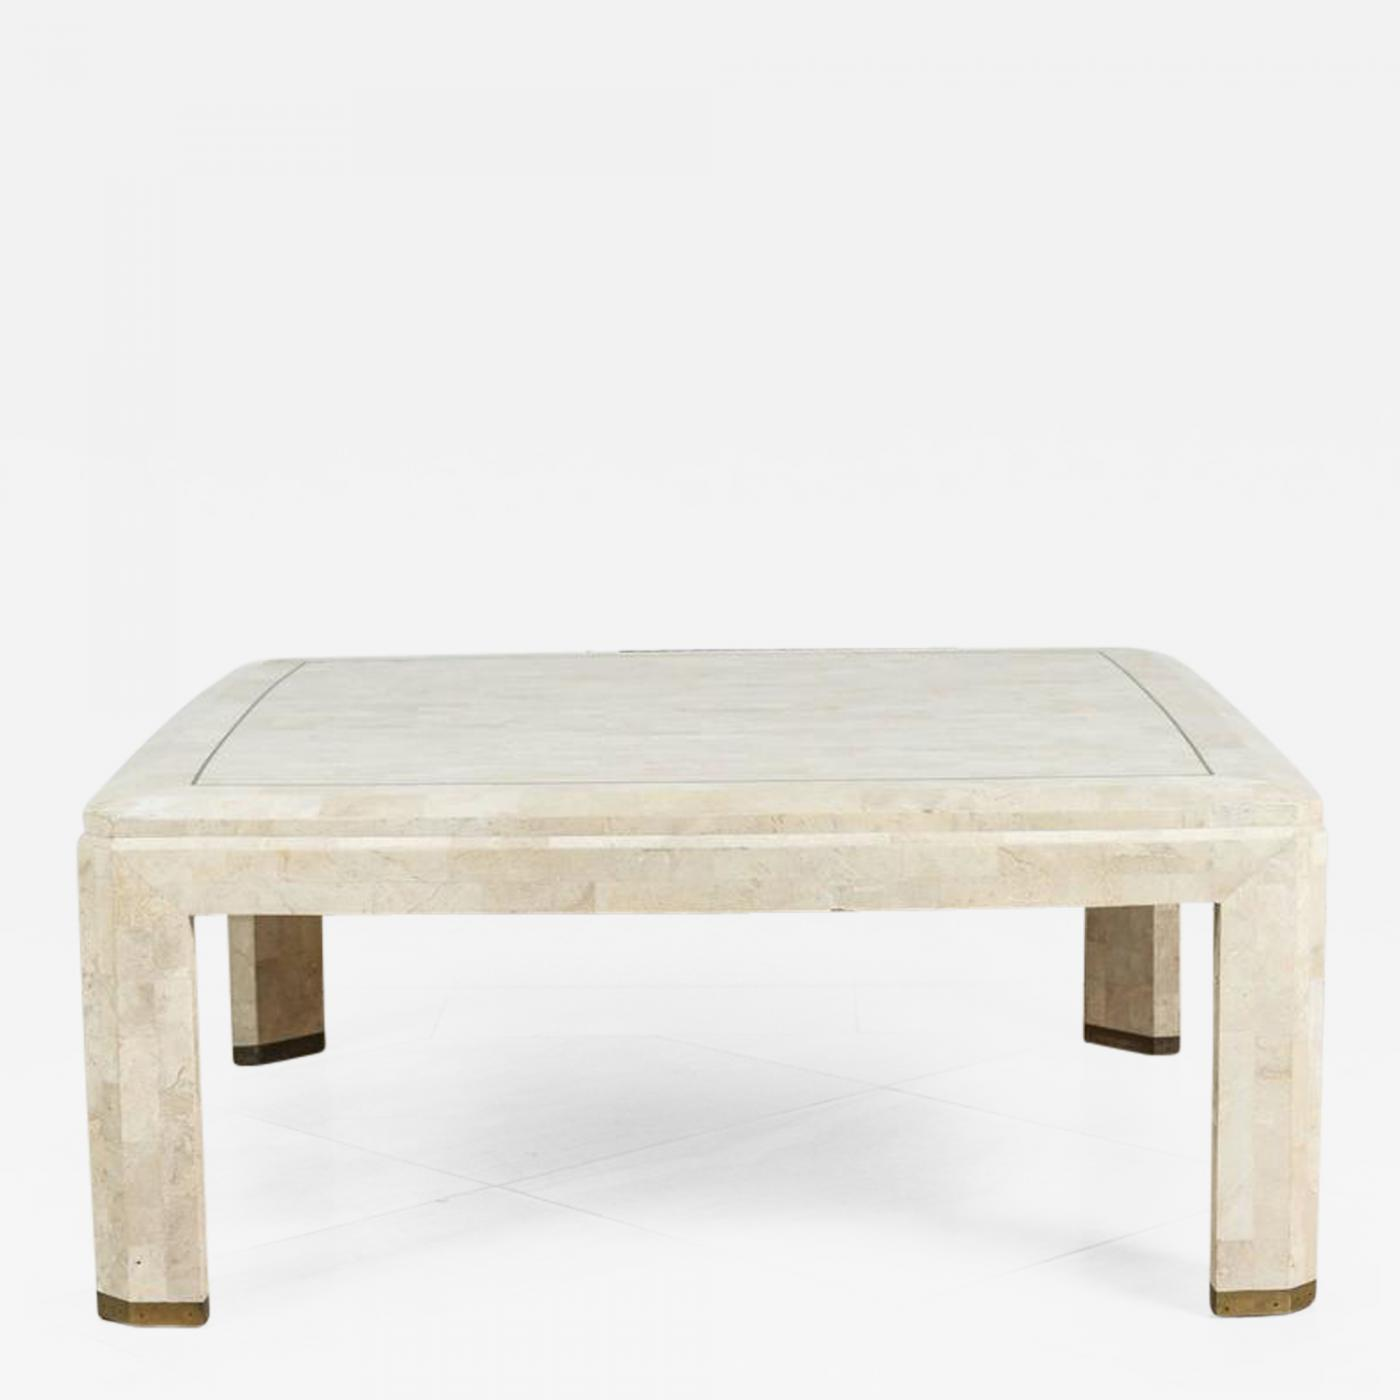 Maitland Smith Maitland Smith Mosaic Square Ivory Coffee Table